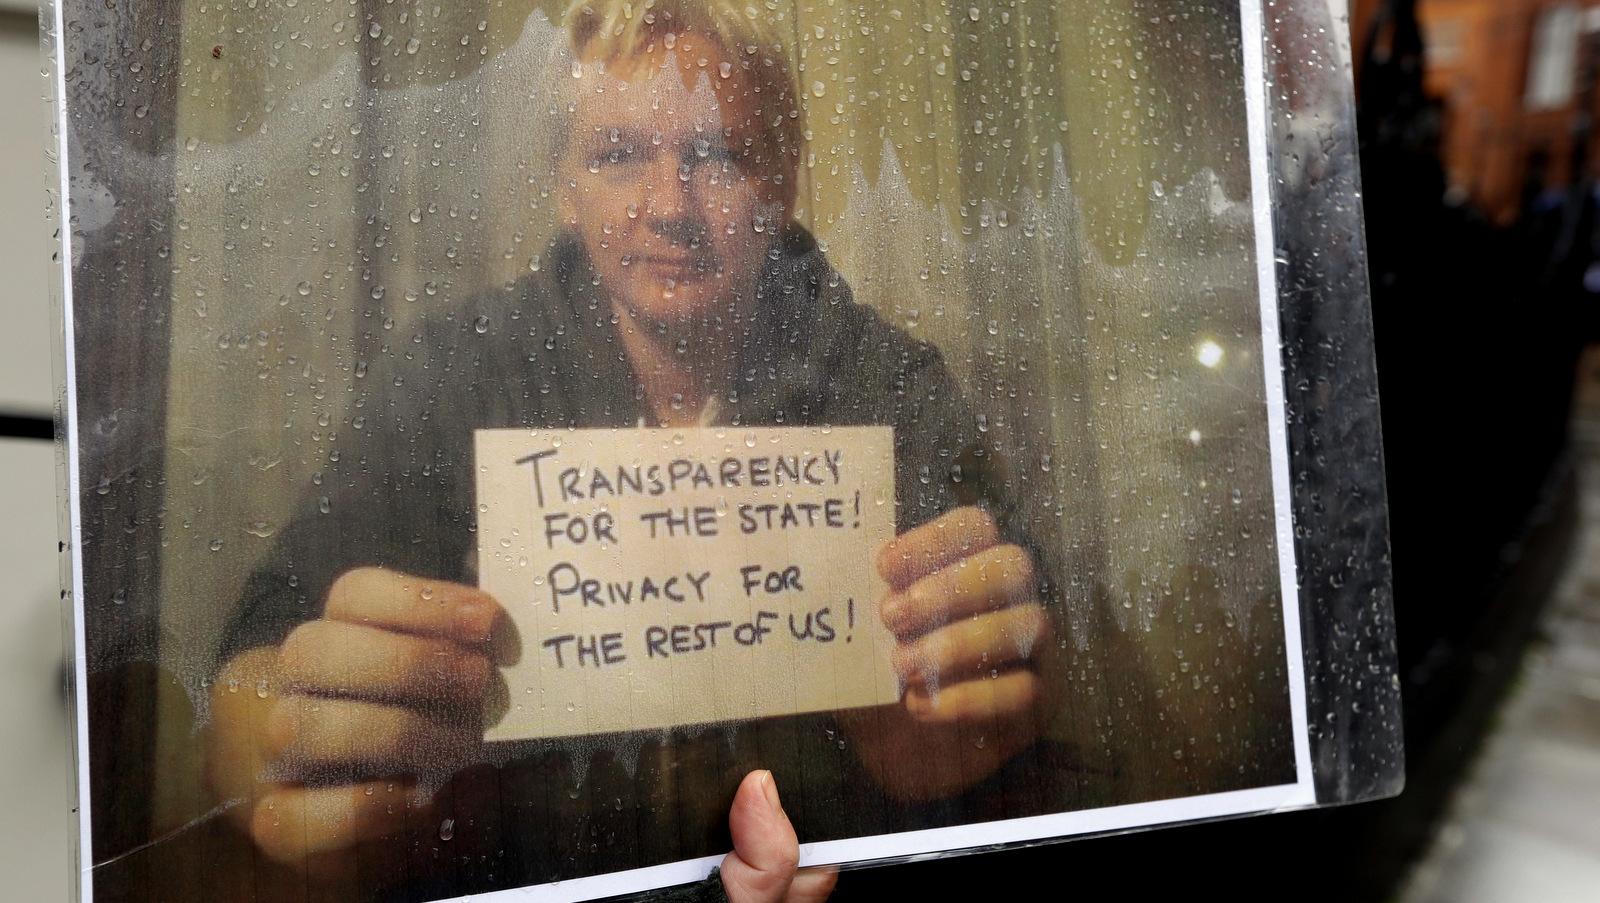 Ecuador Continues Playing Hardball With Julian Assange